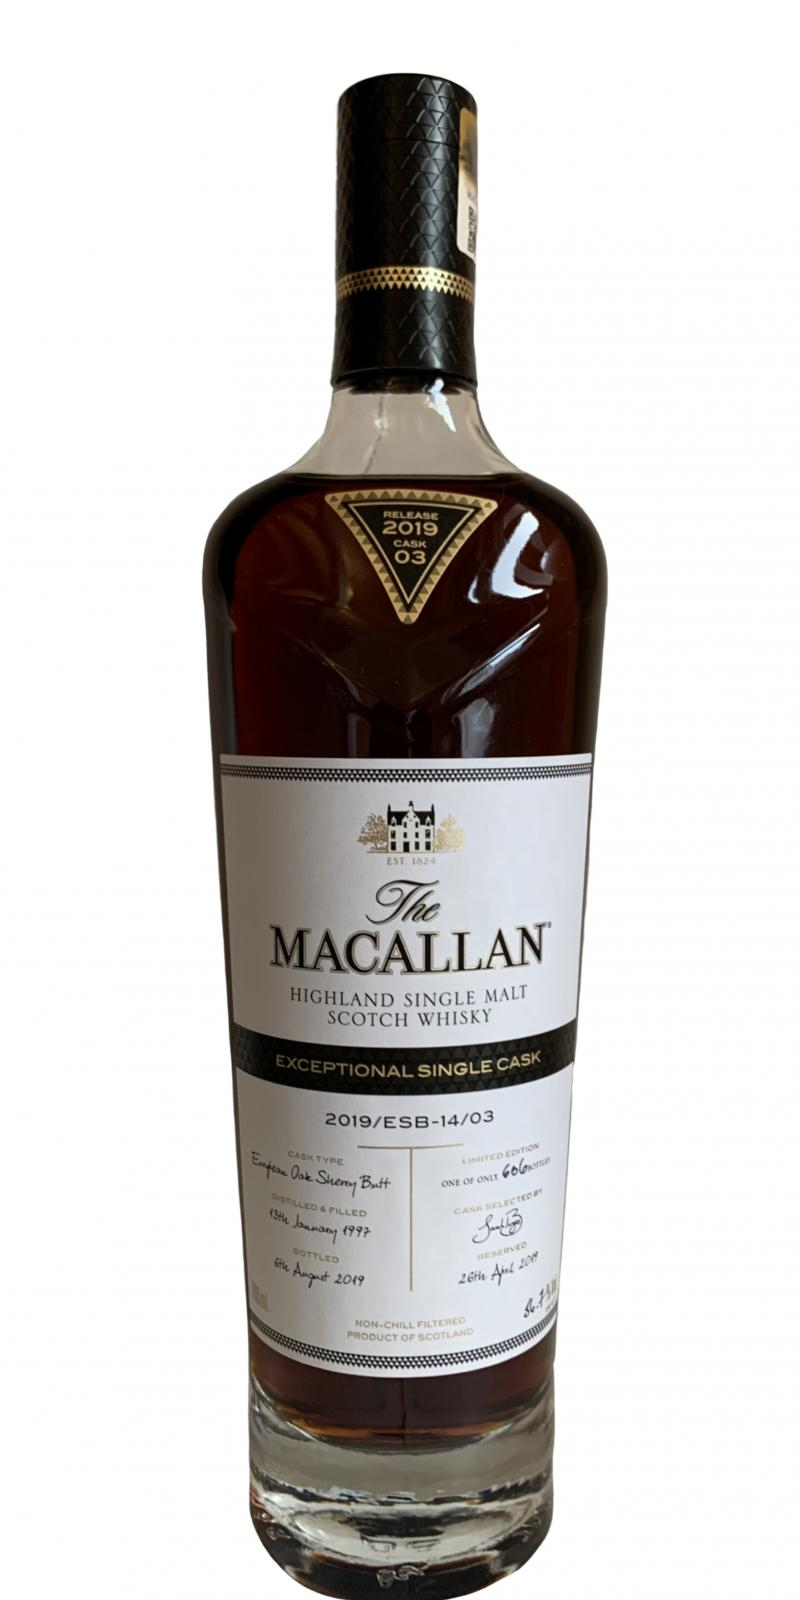 Macallan 2019/ESB-14/03